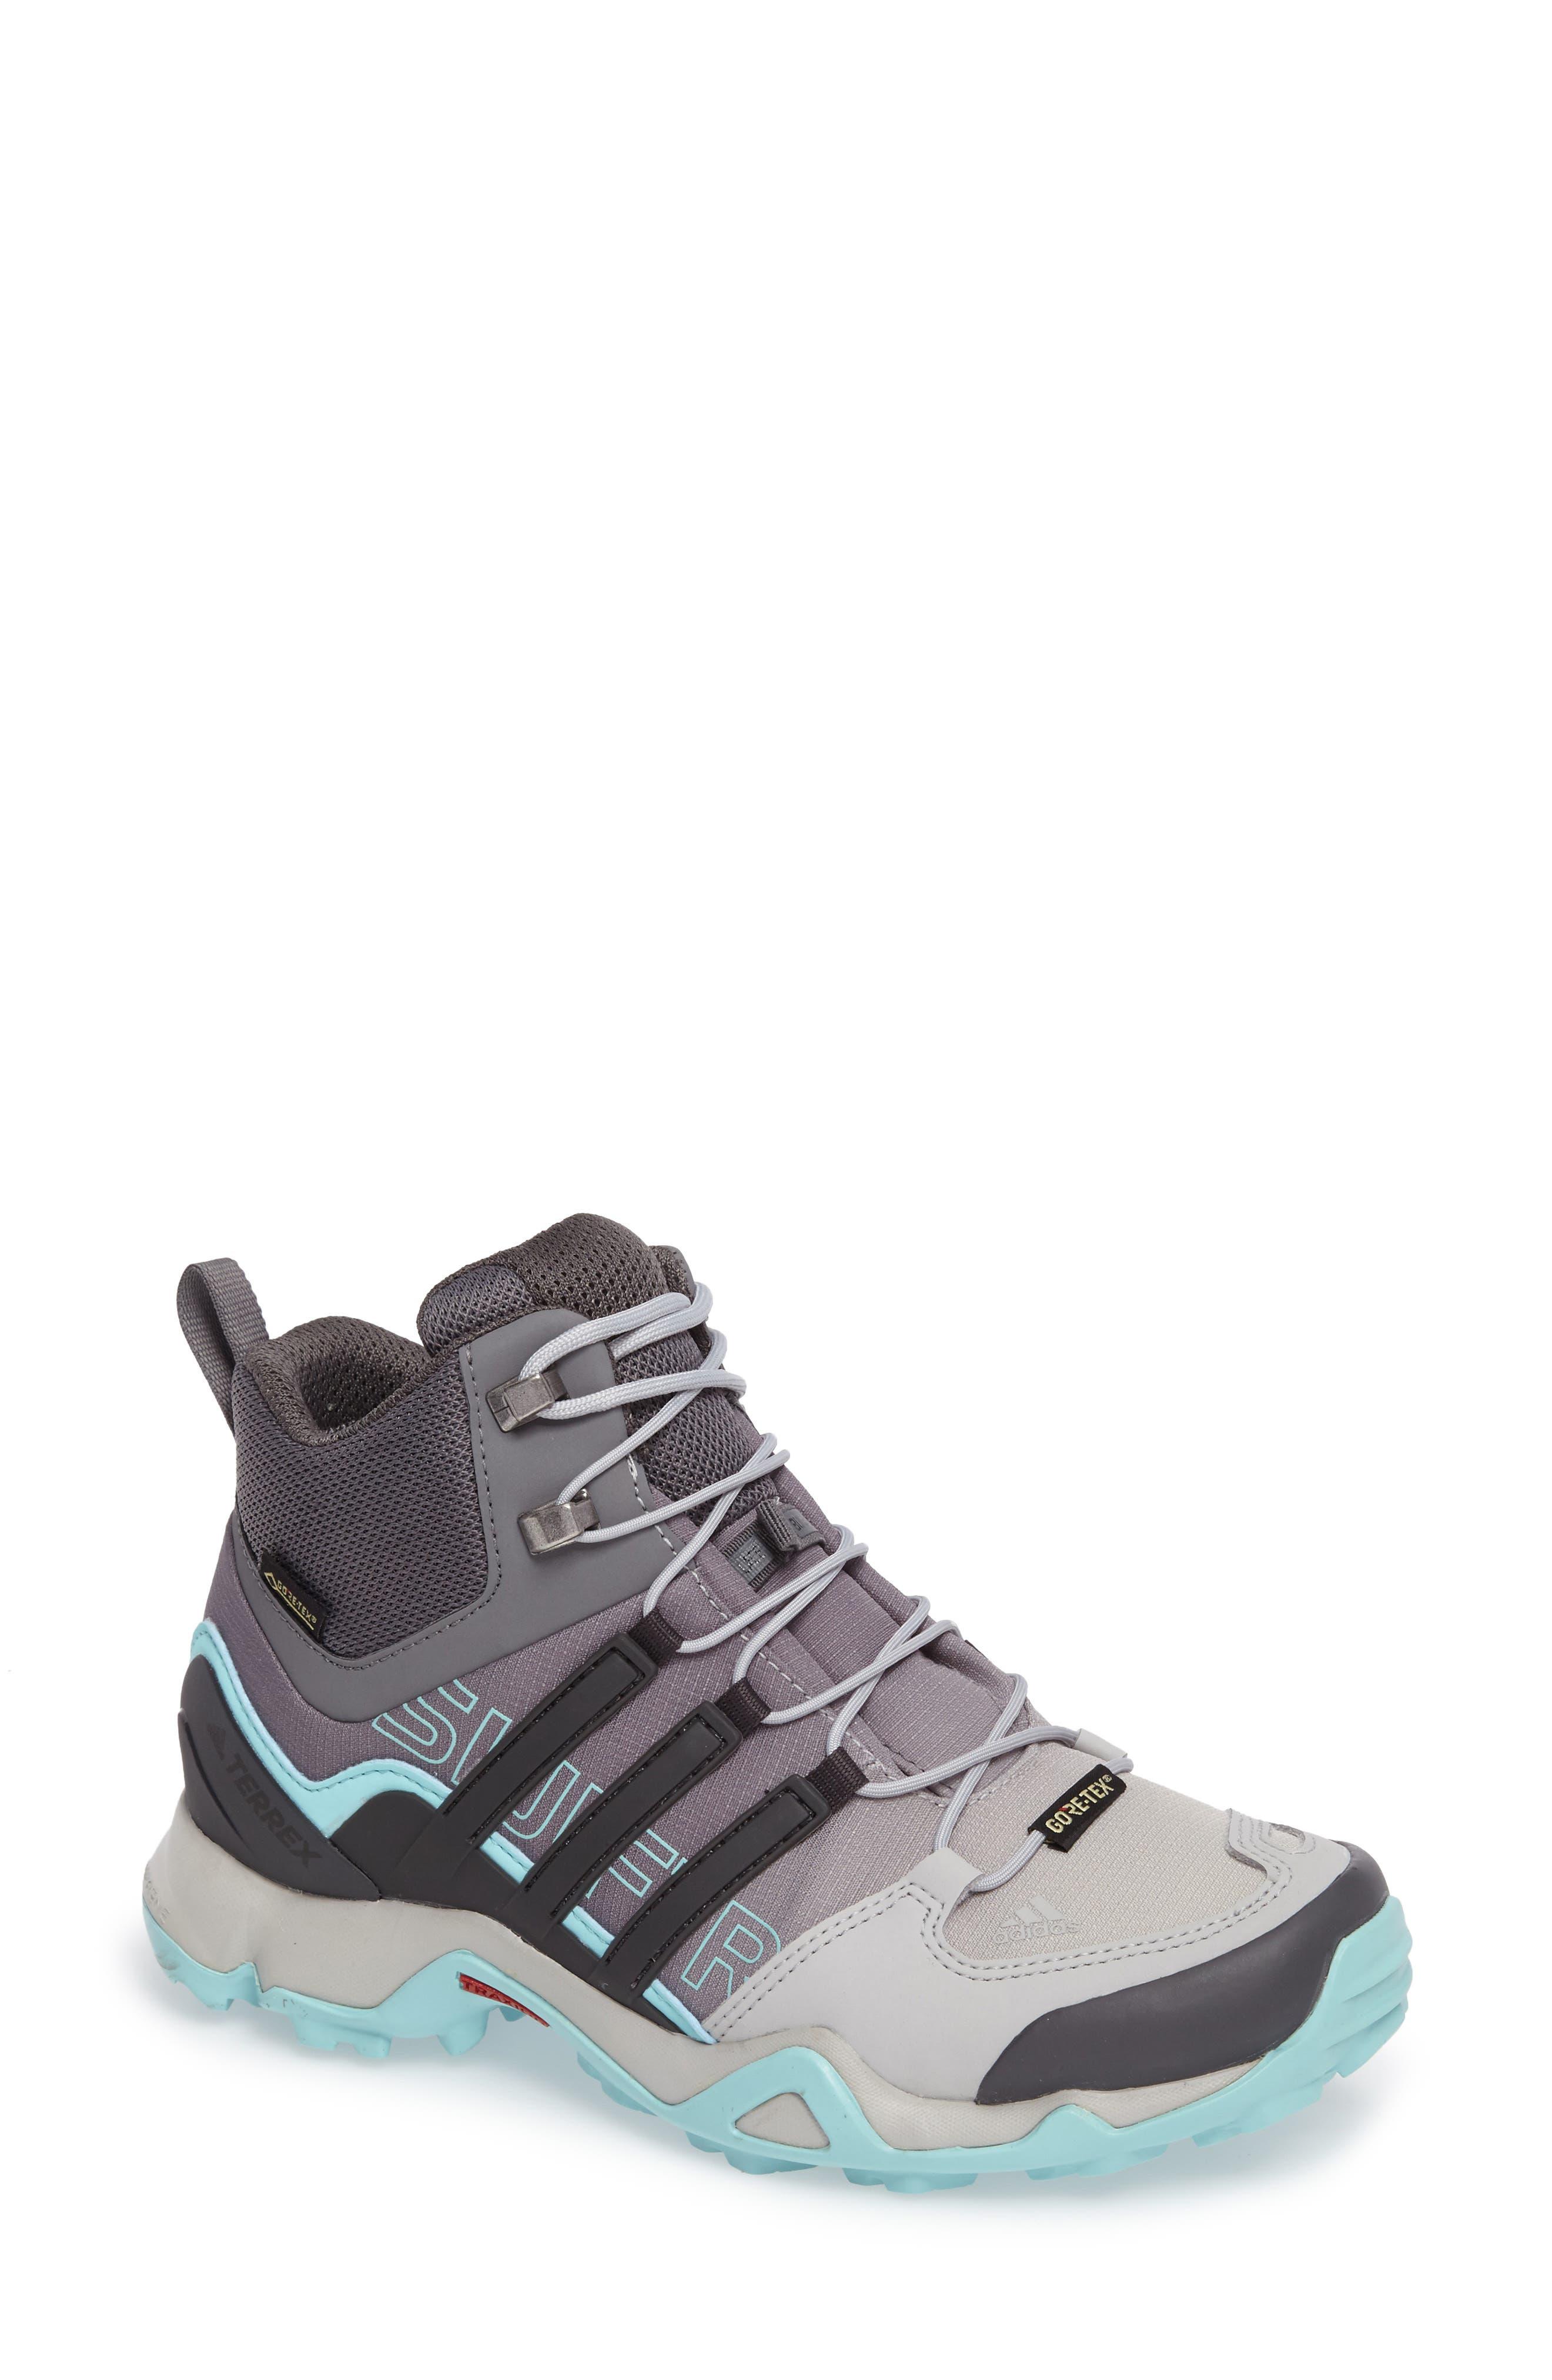 Terrex Swift R GTX Mid Hiking Boot,                         Main,                         color, 020